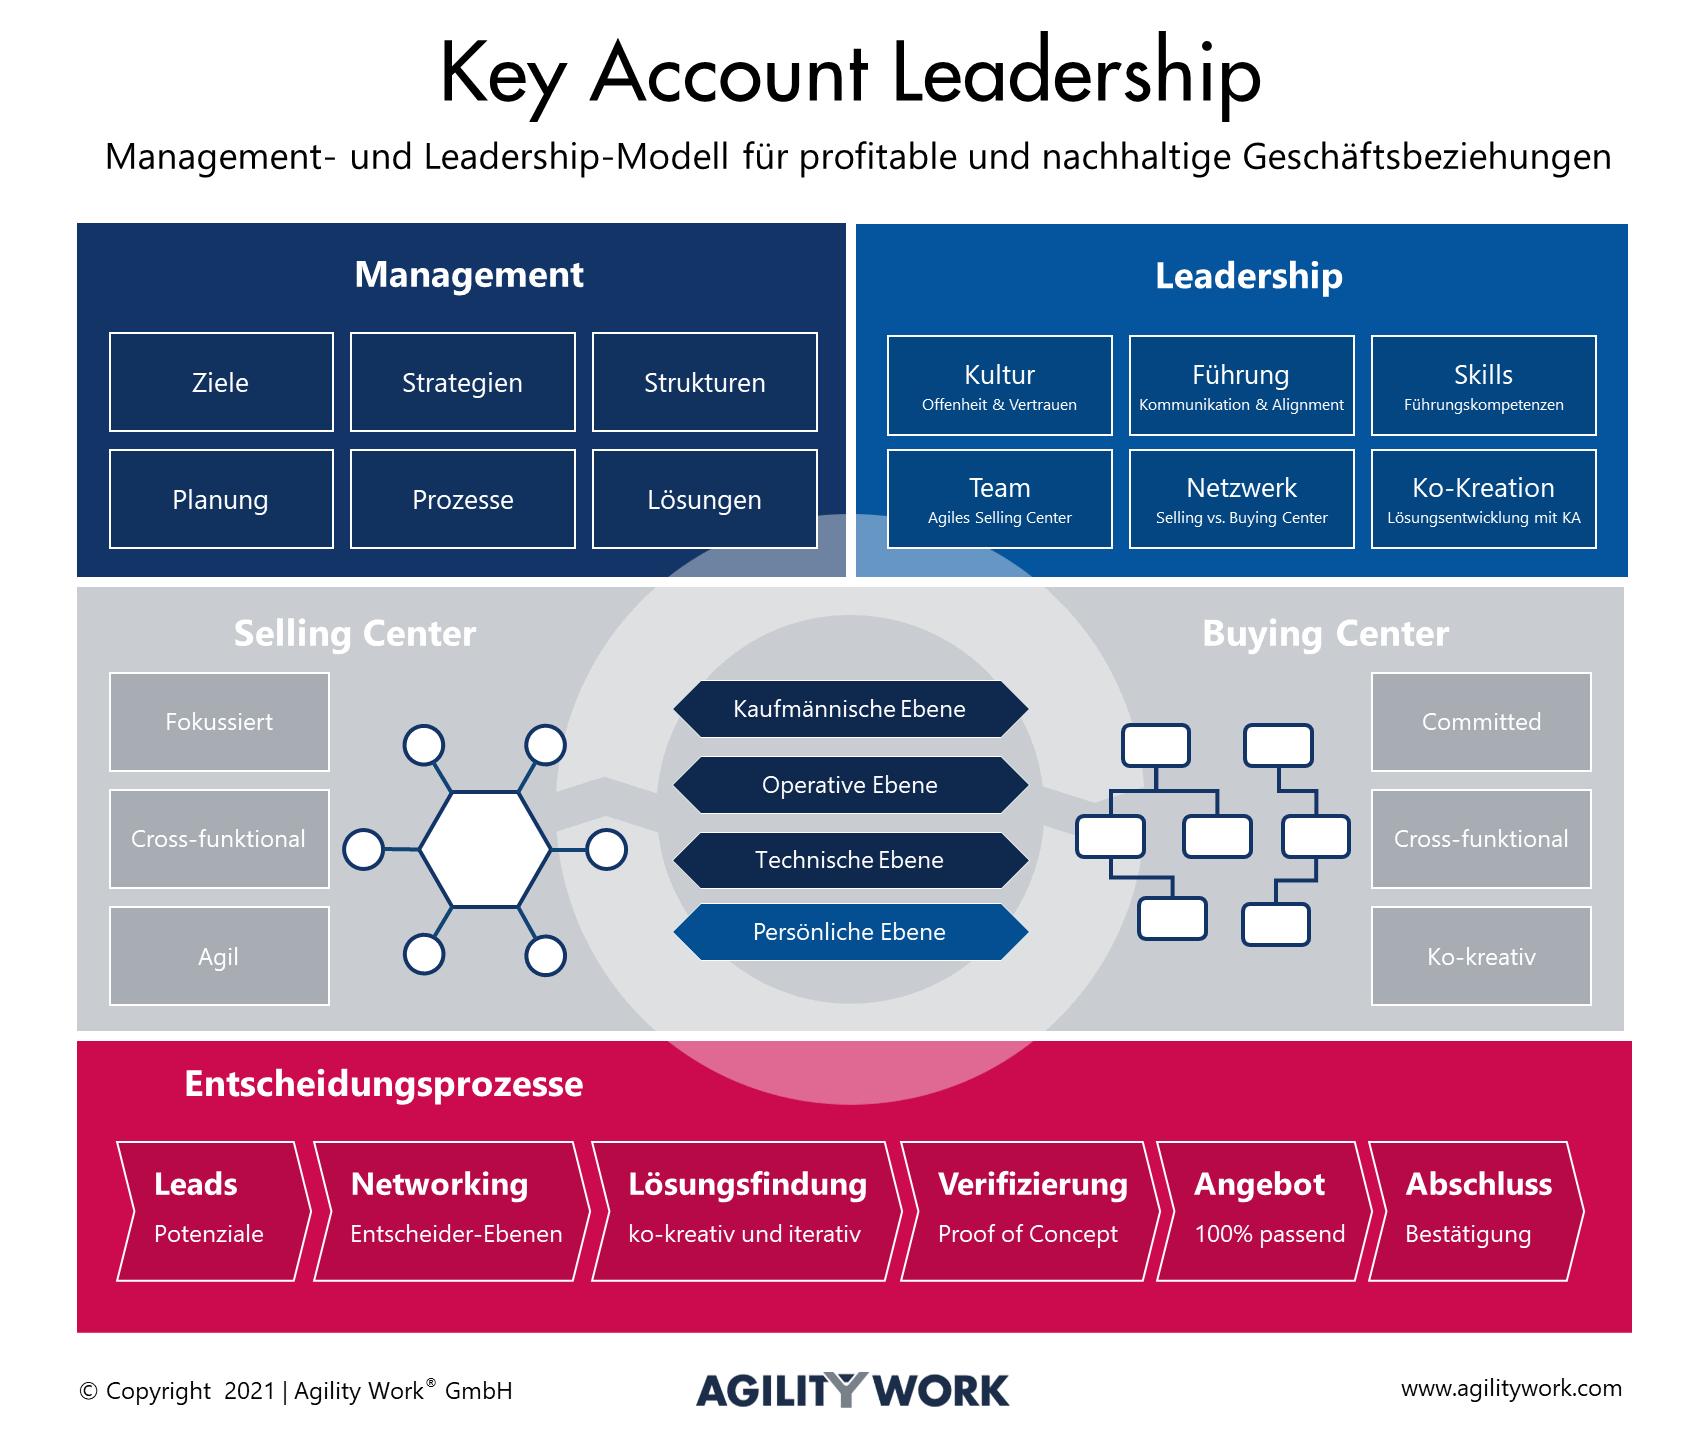 Key Account Leadership